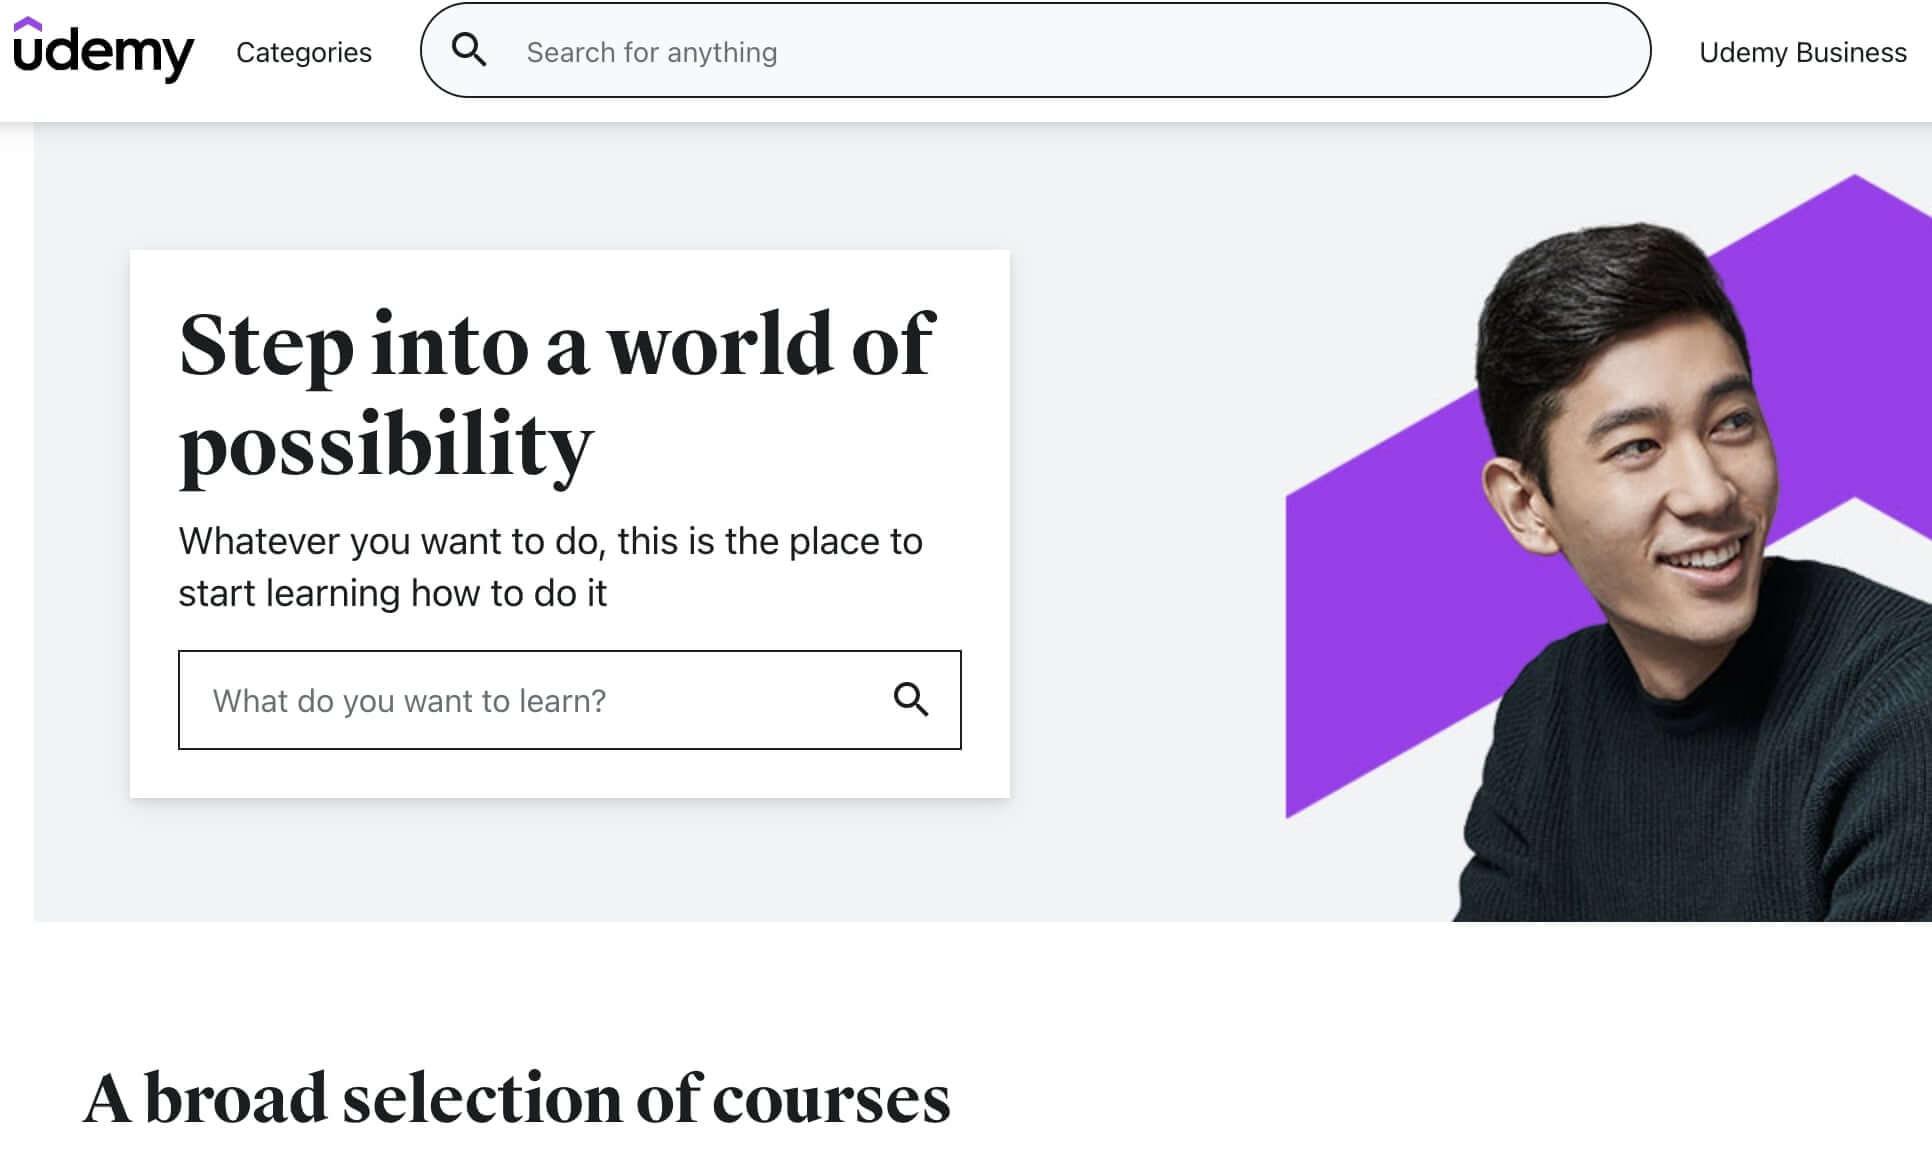 udemy-website